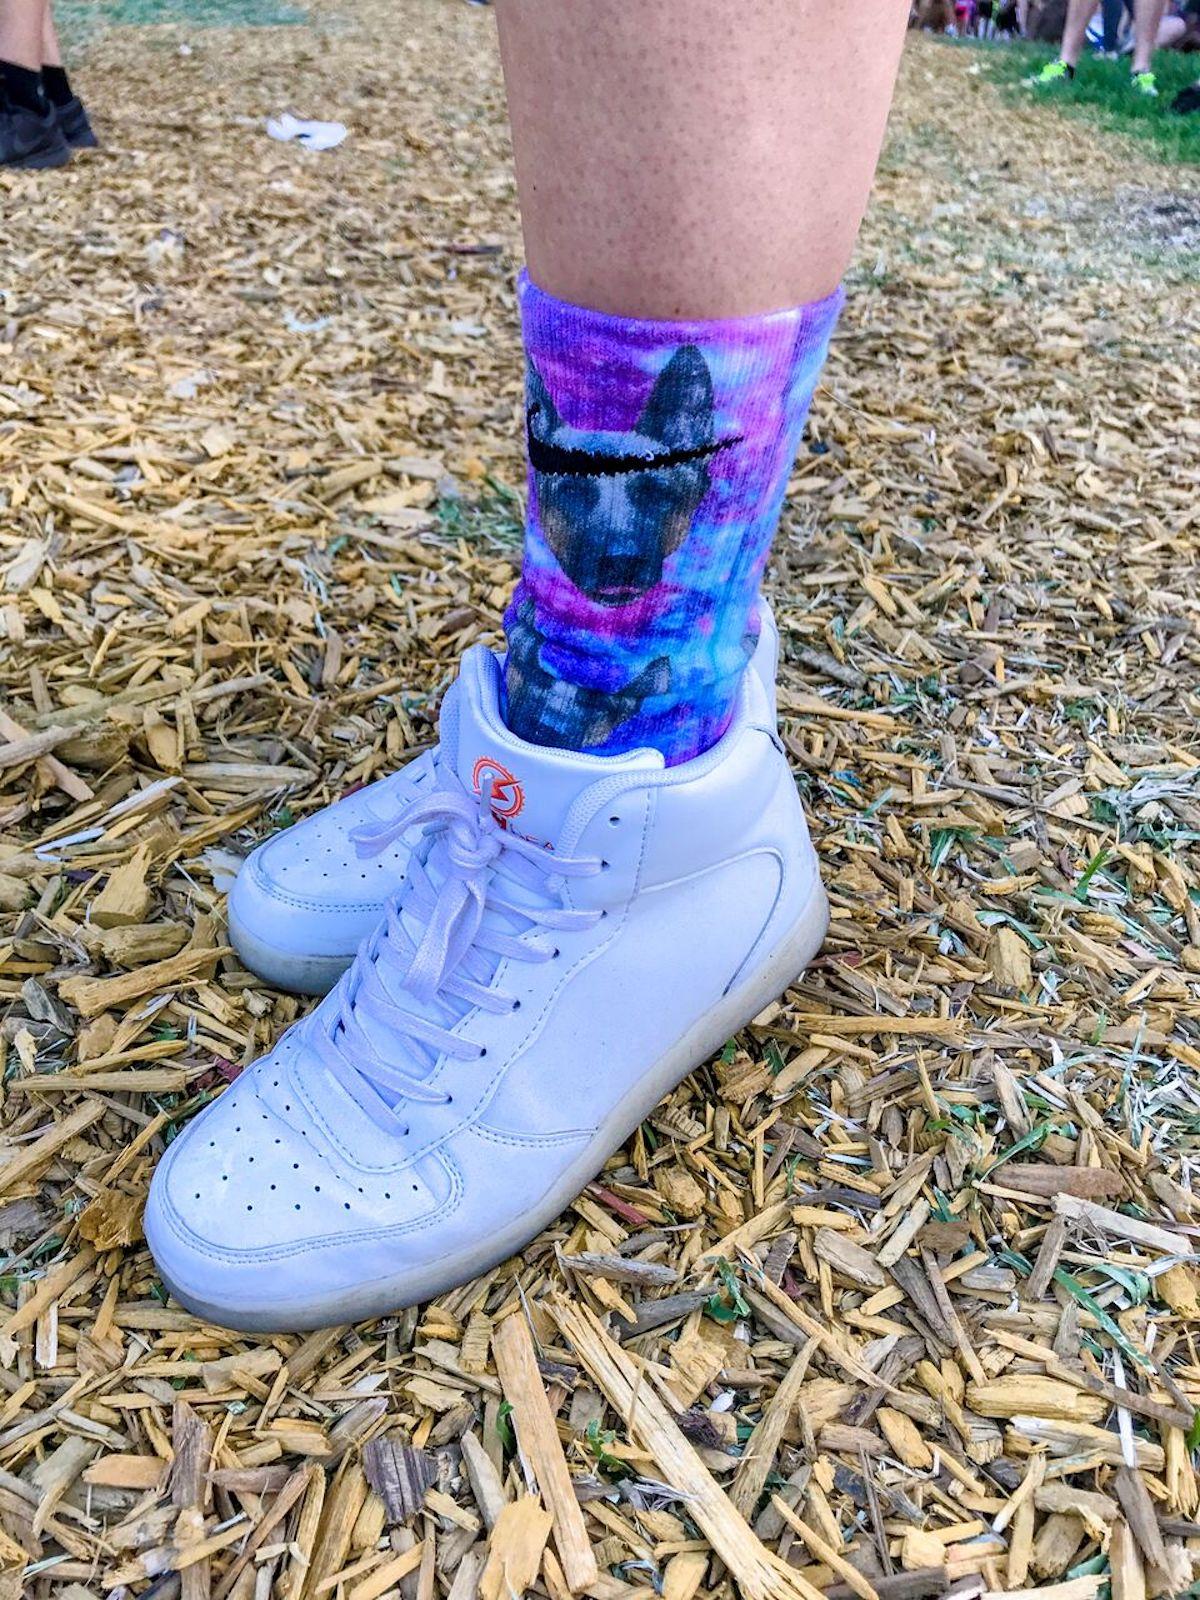 <ULTRA MUSIC FESTIVAL 2018>ファッションスナップ:シースルー、エナメル素材が最新フェスファッショントレンド? music180326_ultramusicfestival-fashion_8